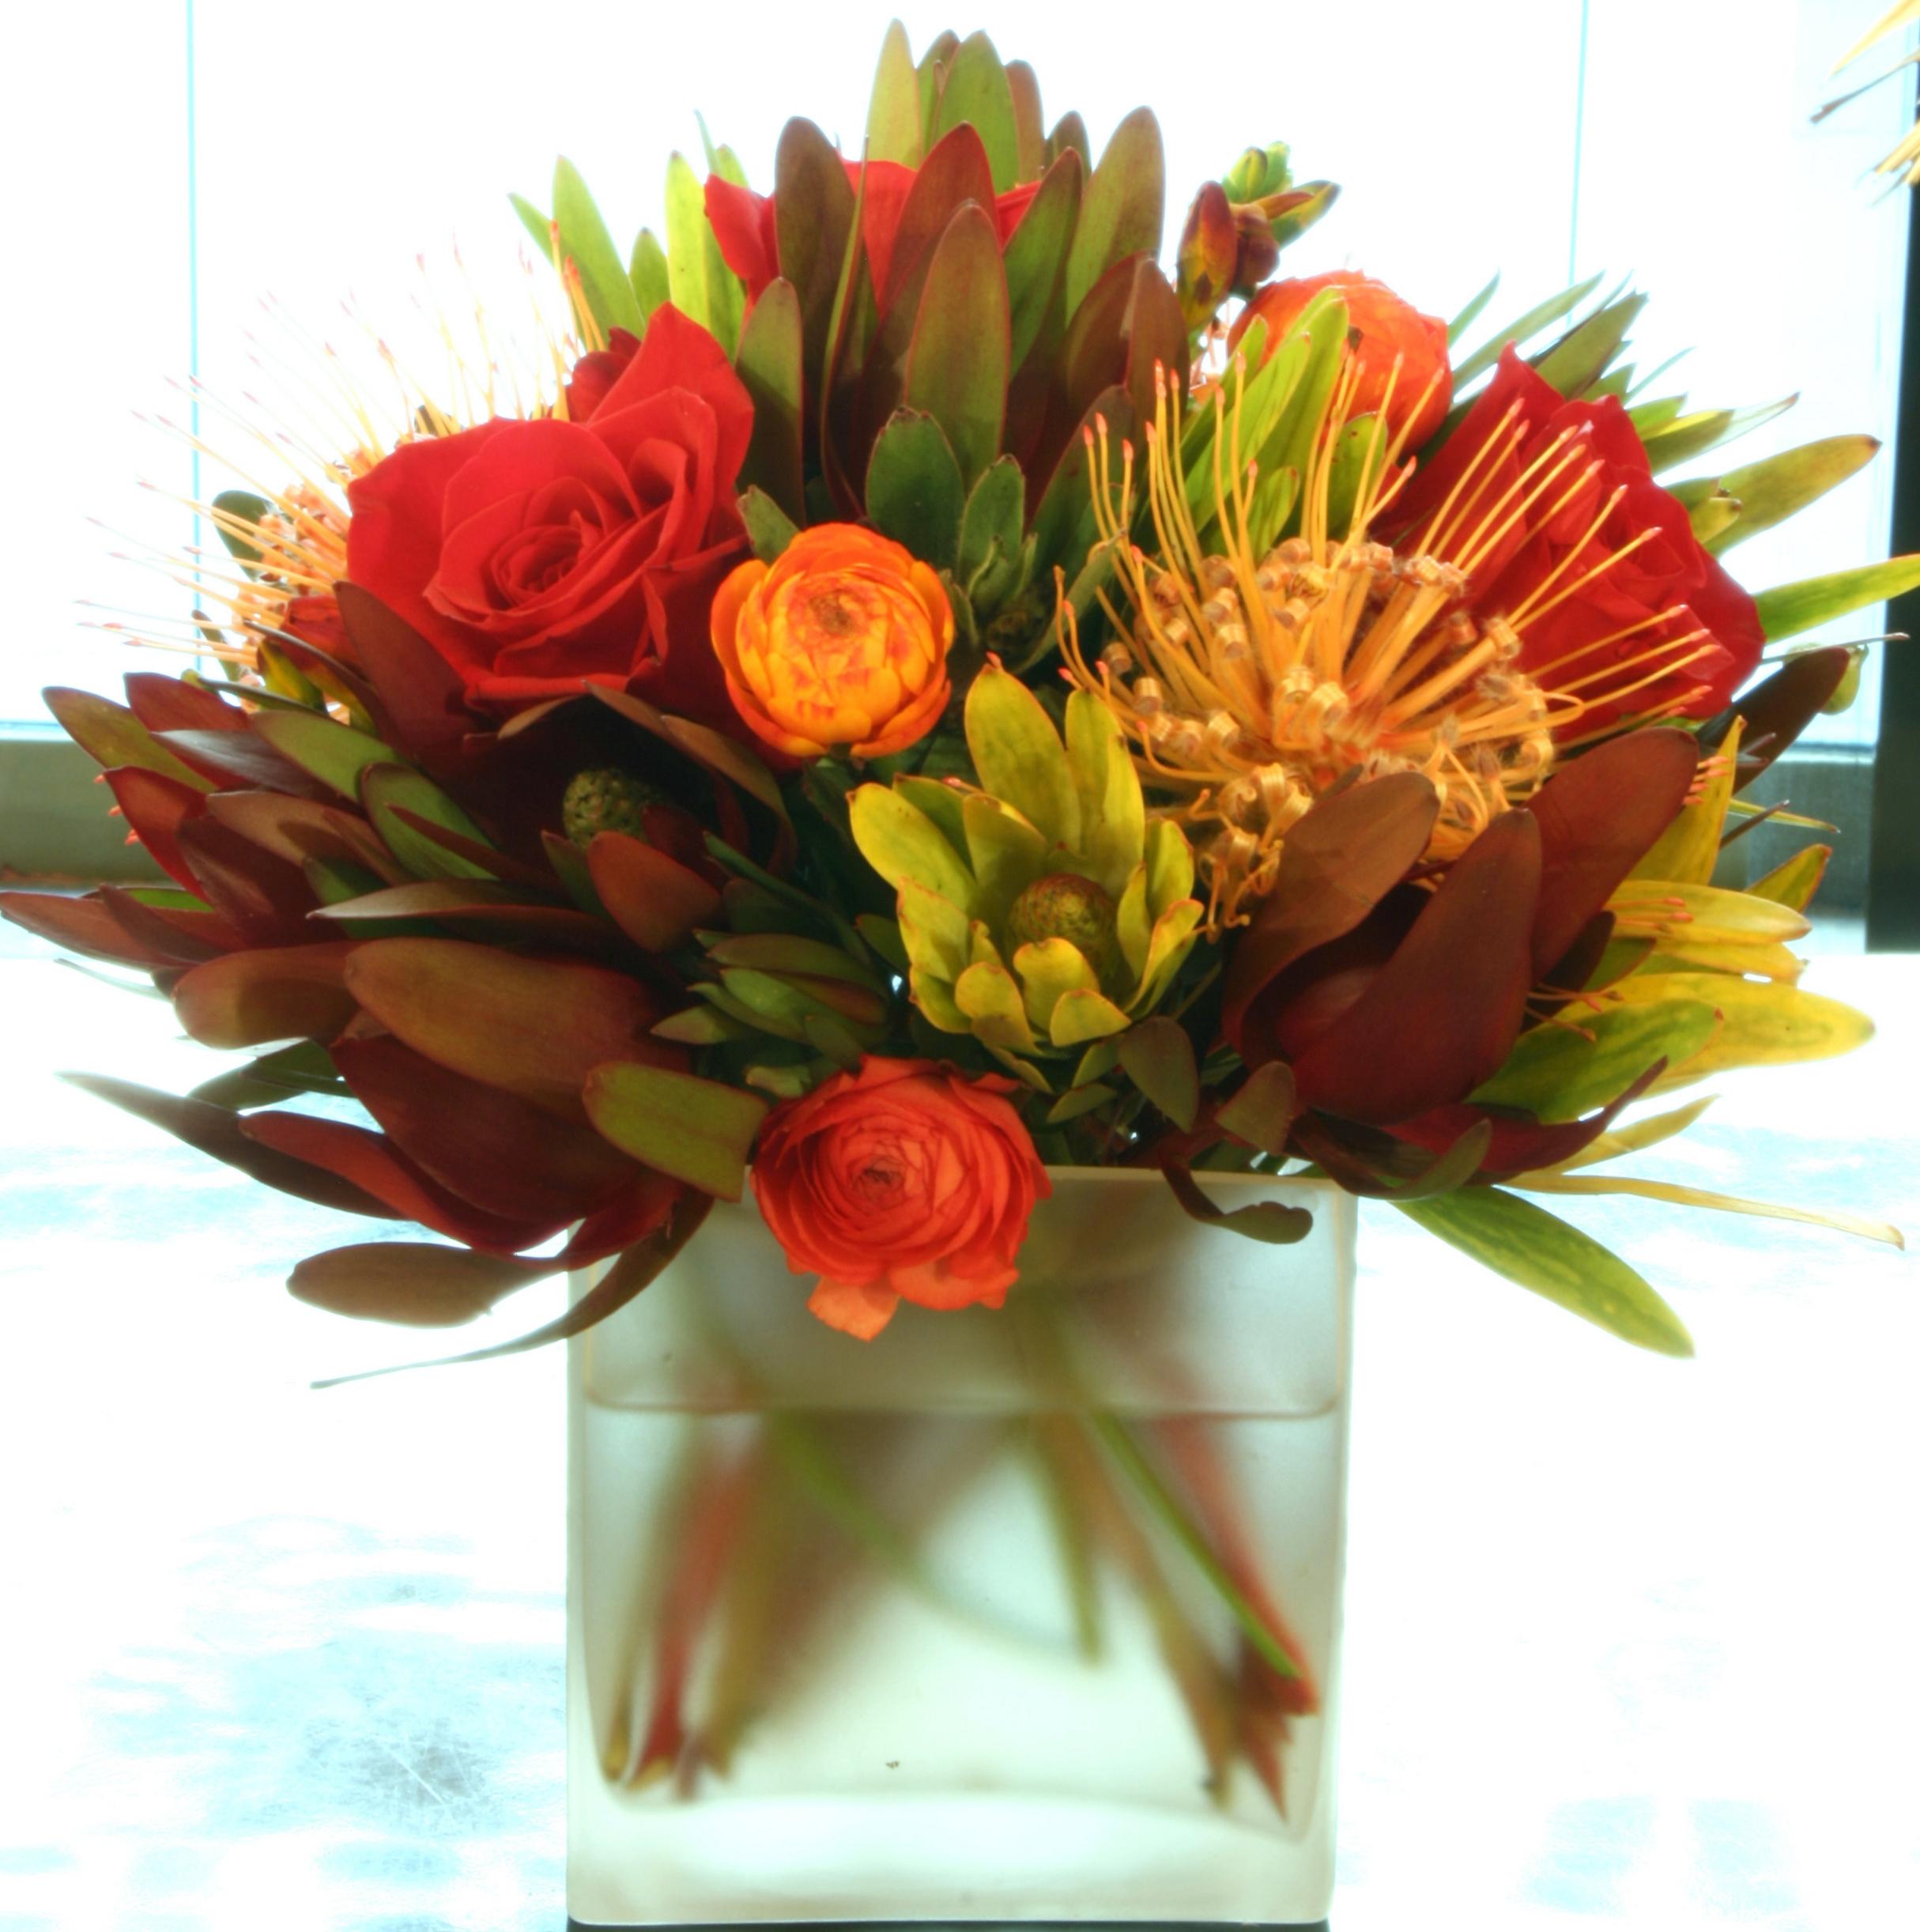 Next Level Floral Design